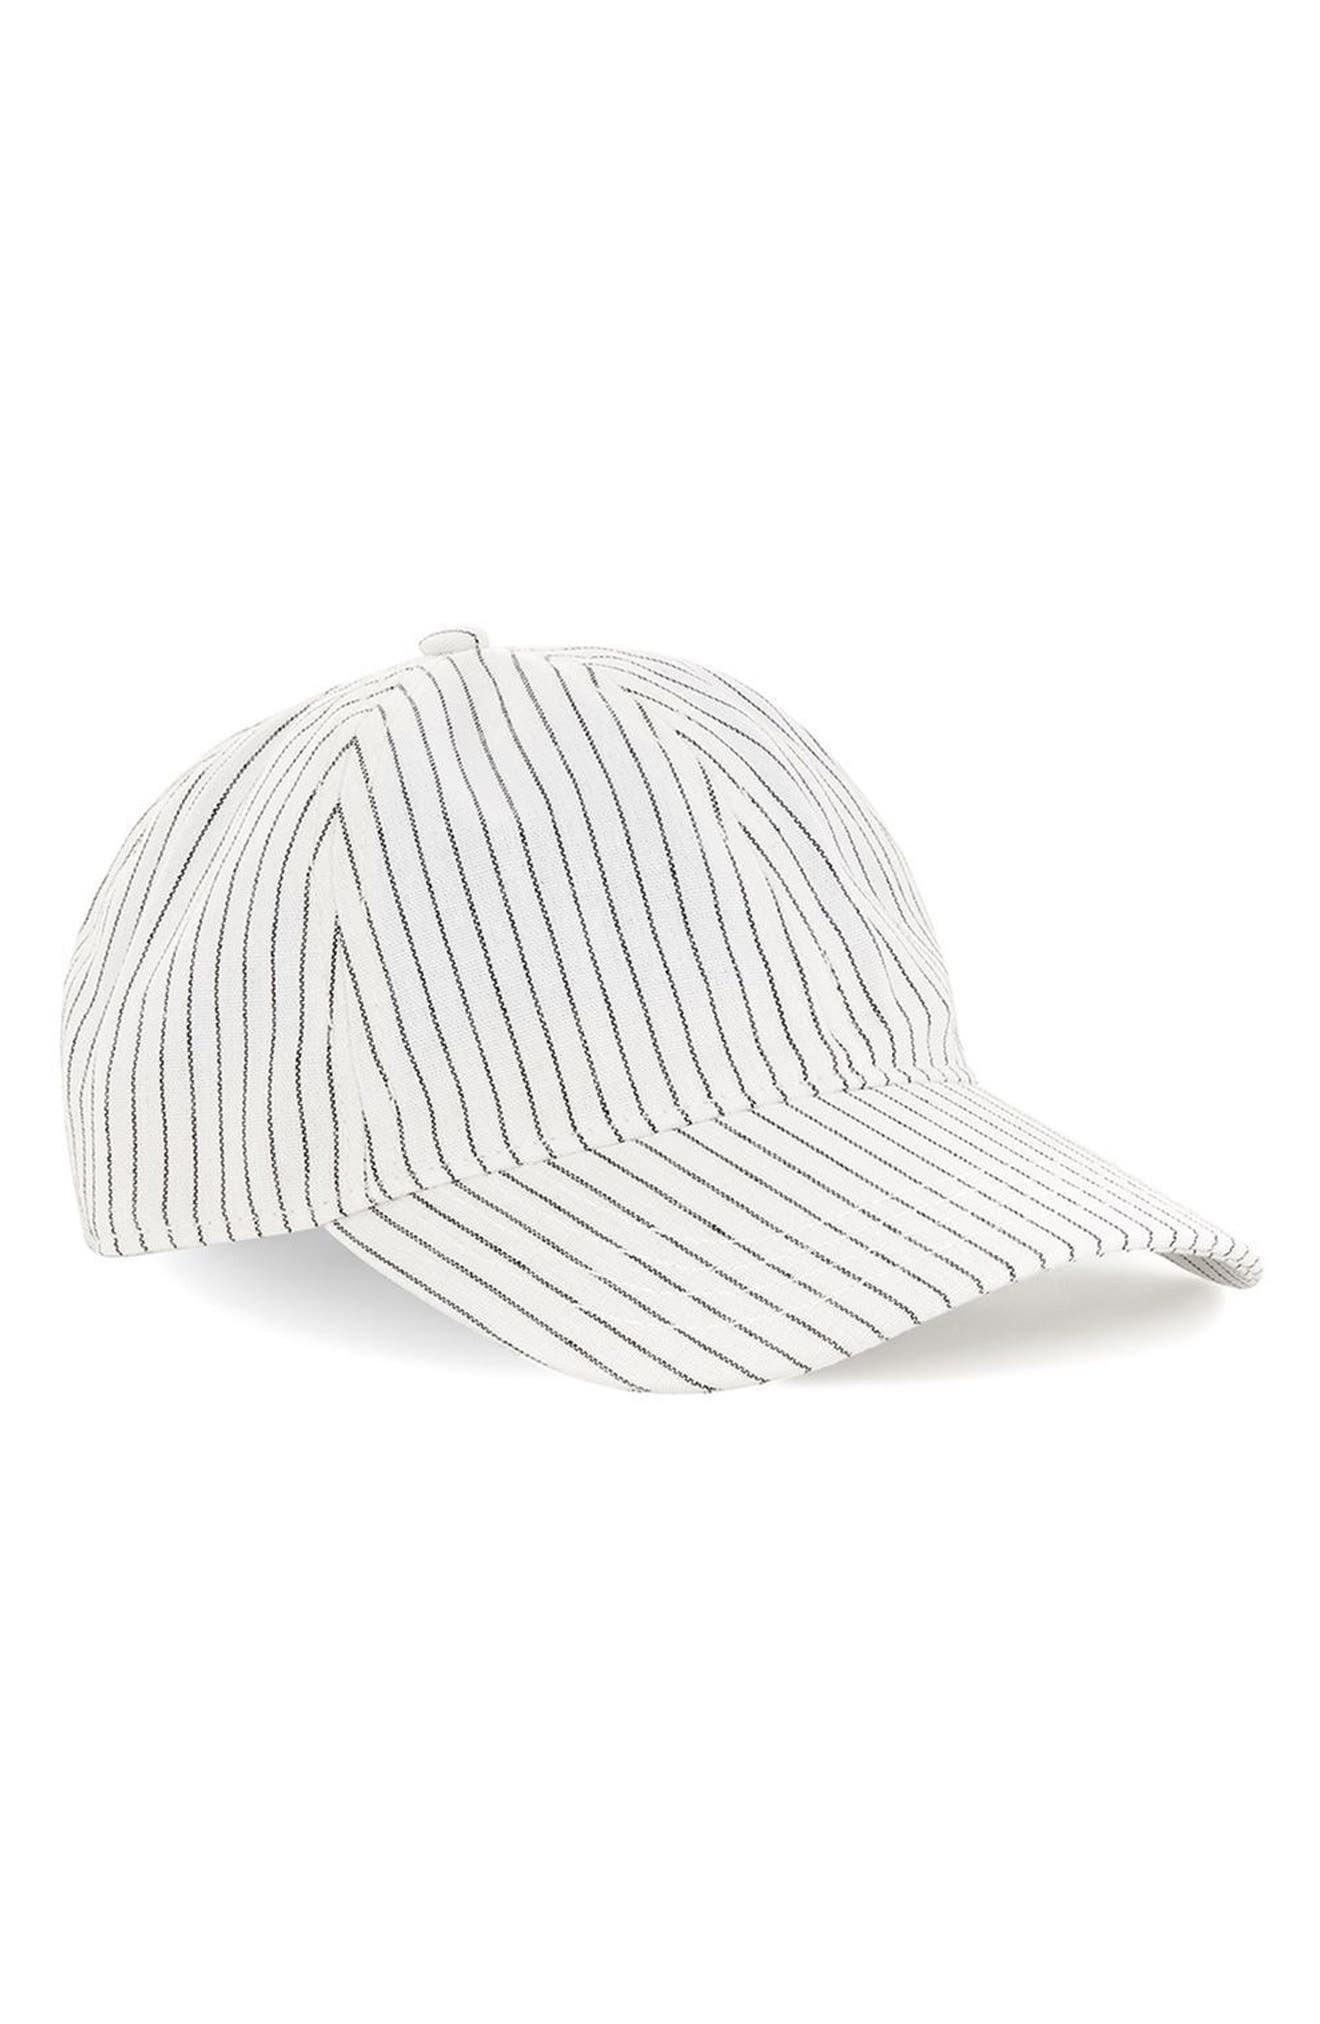 Stripe Boys Curved Peak Cap,                         Main,                         color,